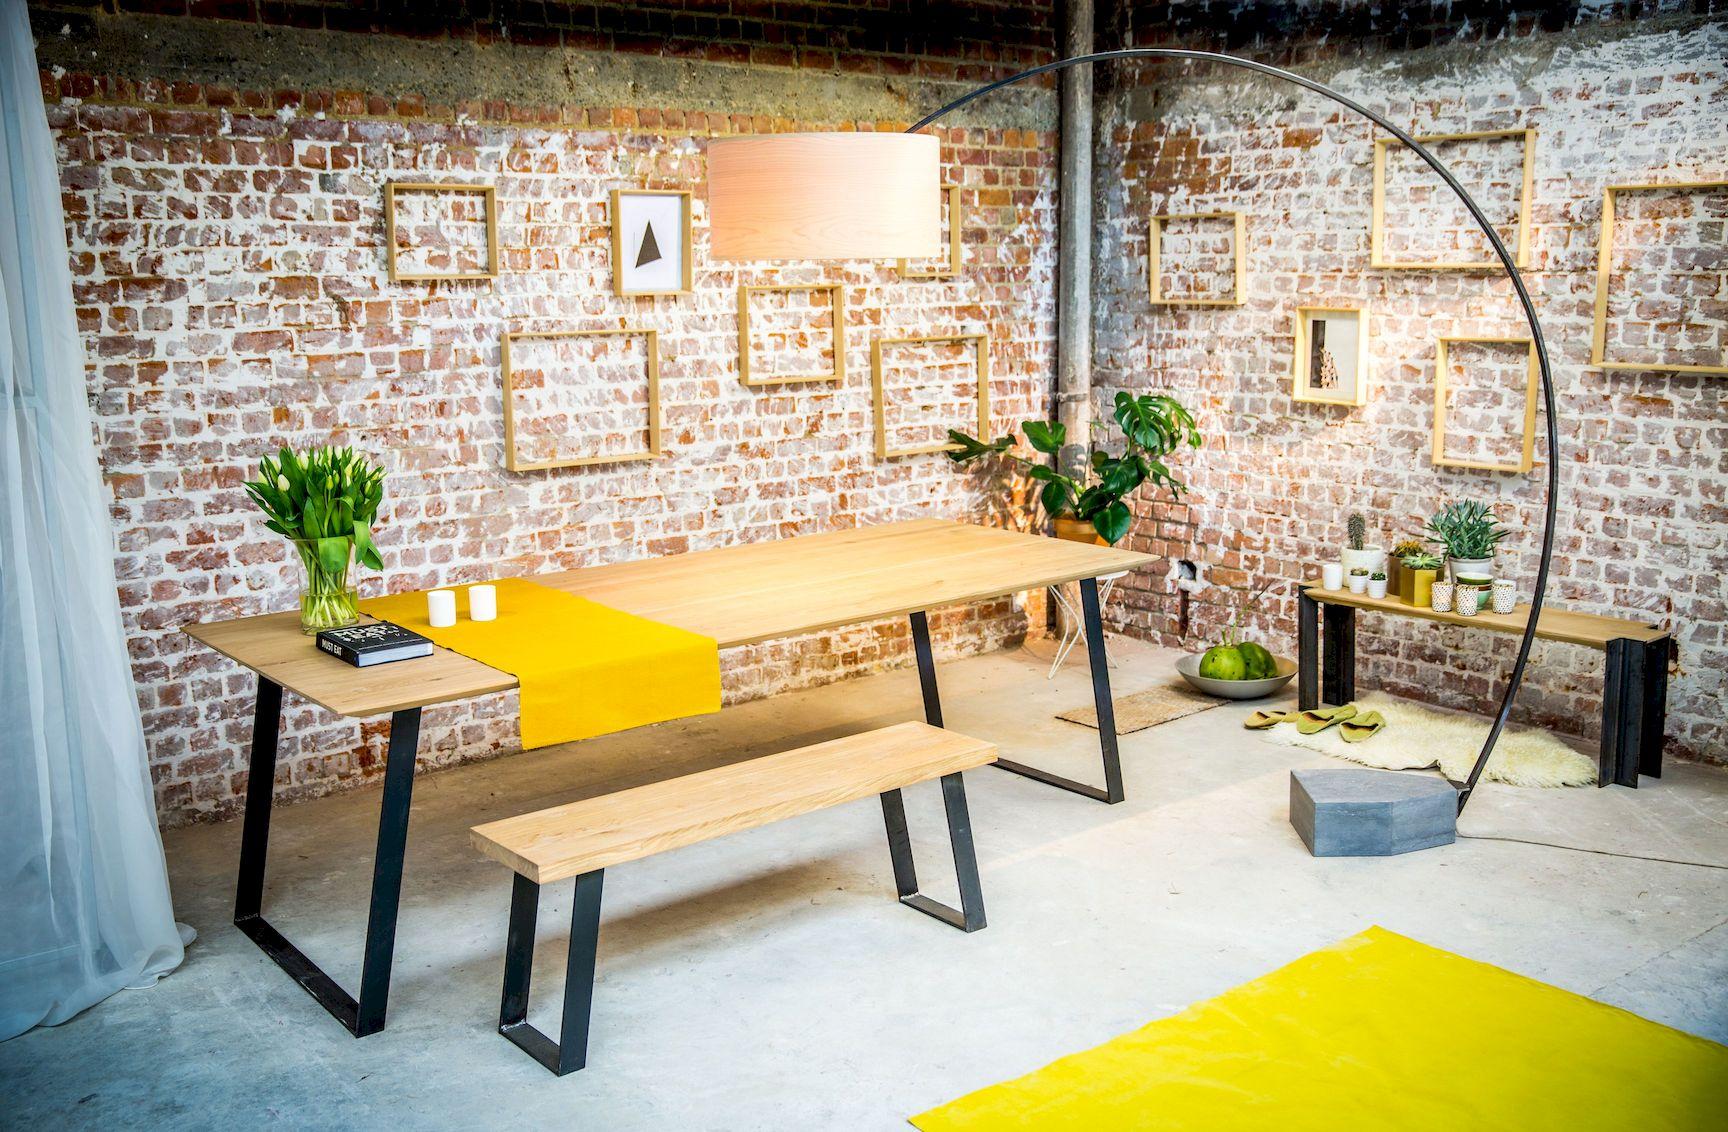 Nieuw leuvens ambachtelijk meubelmerk ooh leven in leuven for Interieur leuven